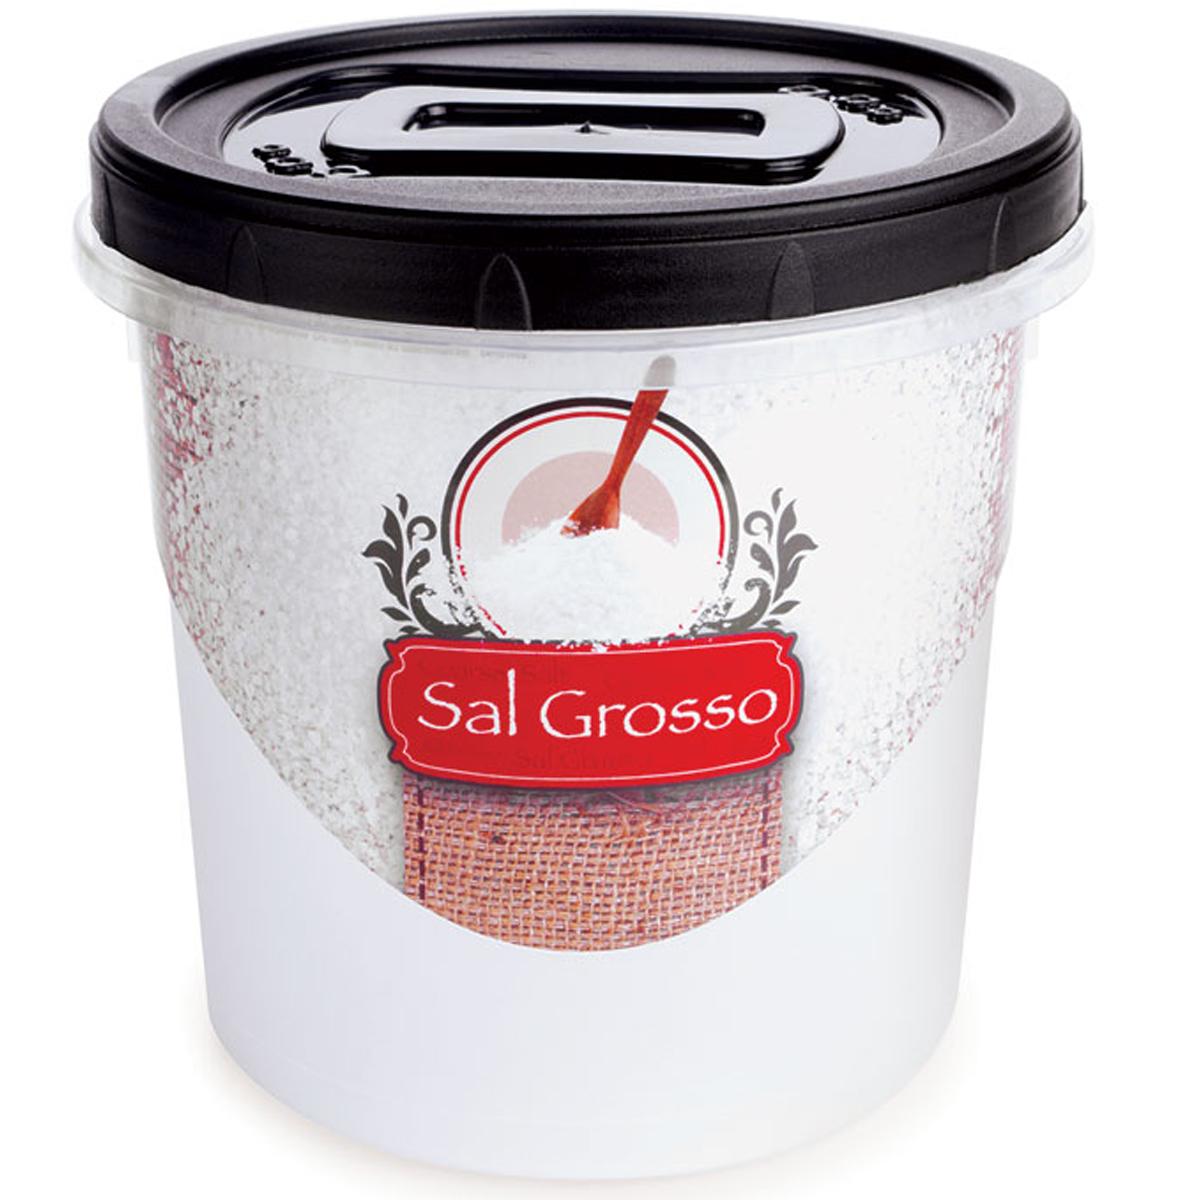 Pote redondo de plástico tampa rosca 1,8L decor Sal Grosso